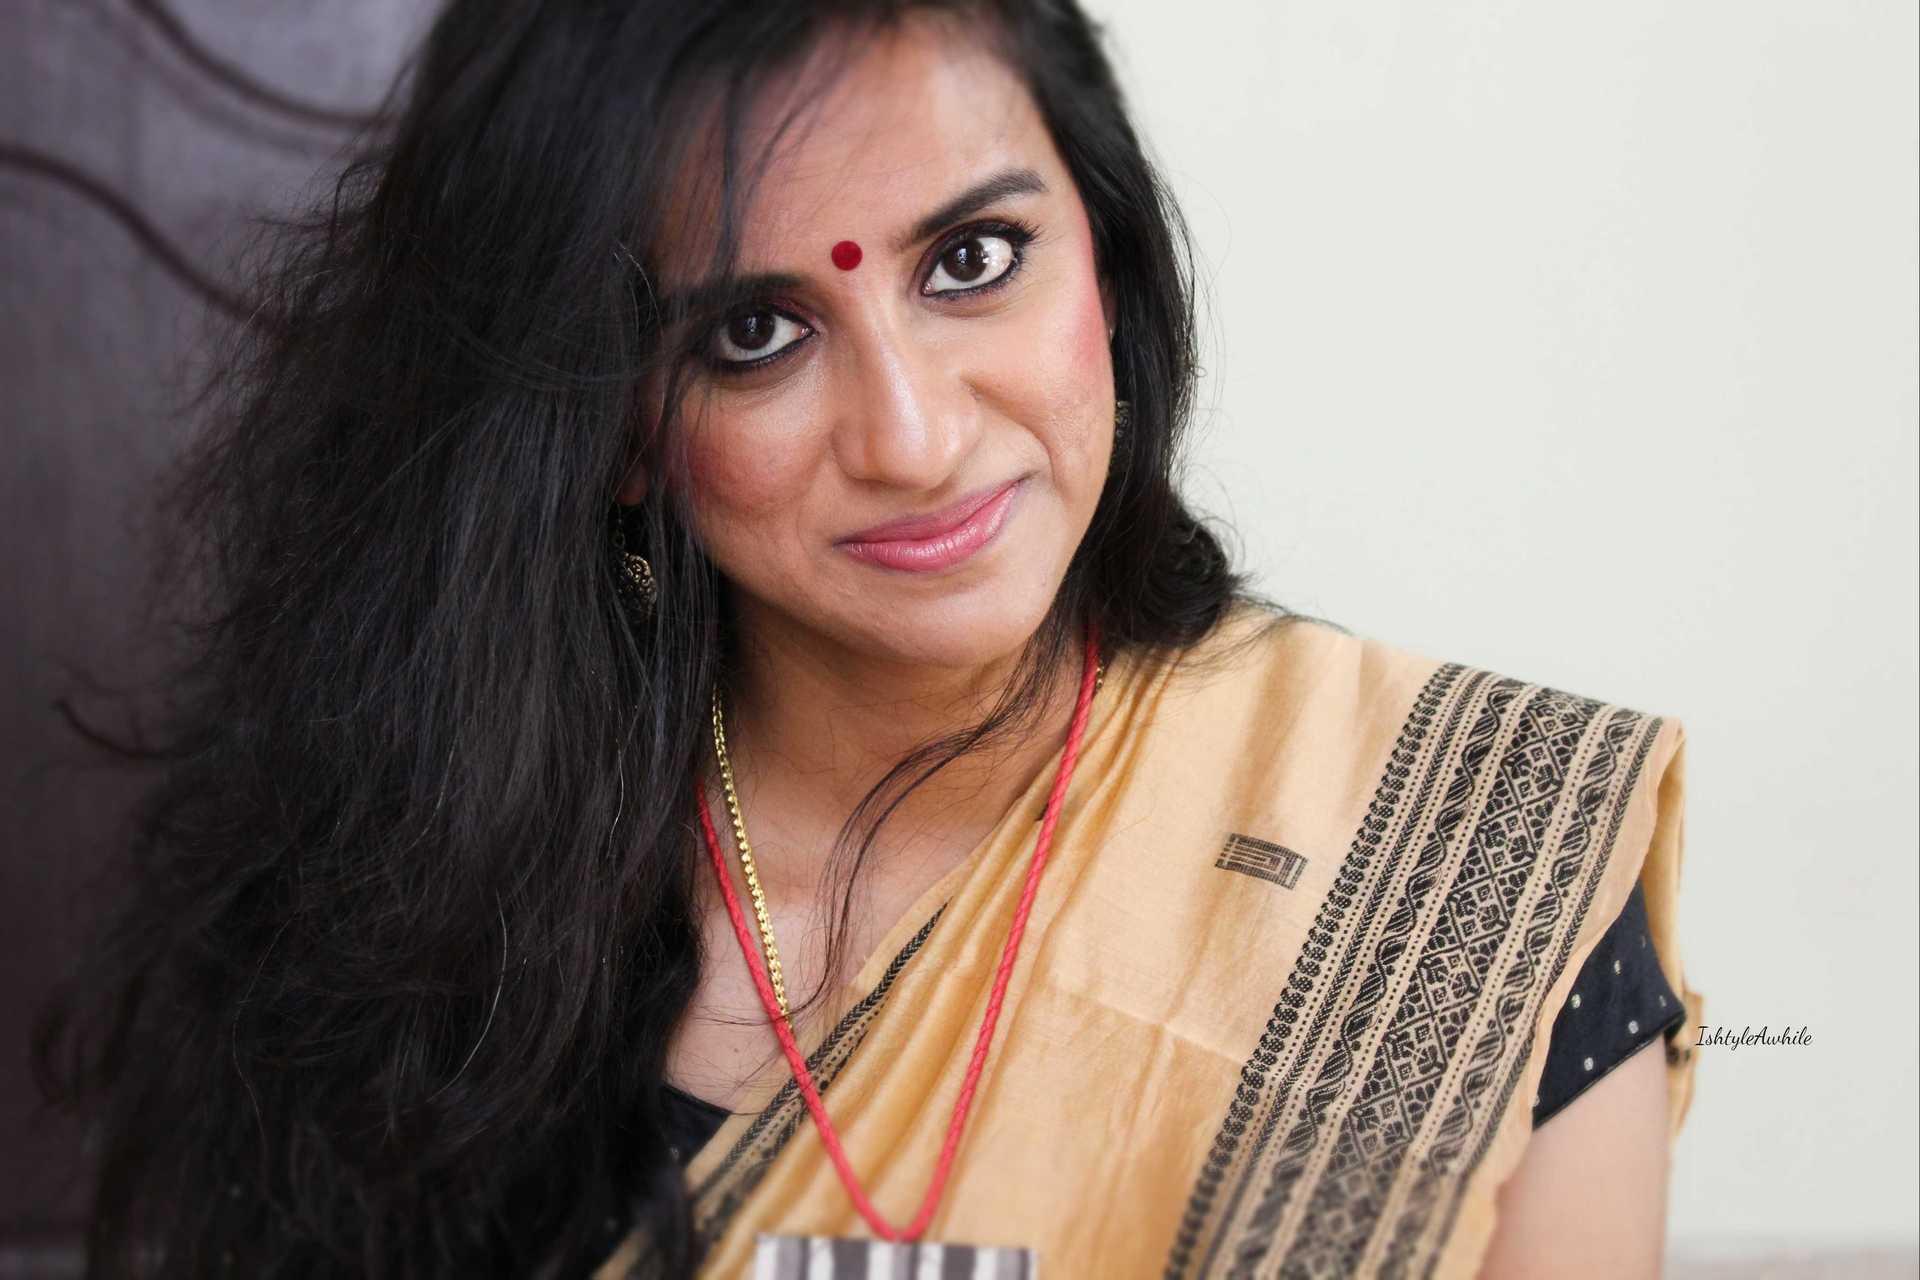 IshtyleAwhile - burgandy eye makeup chennai beauty blogger